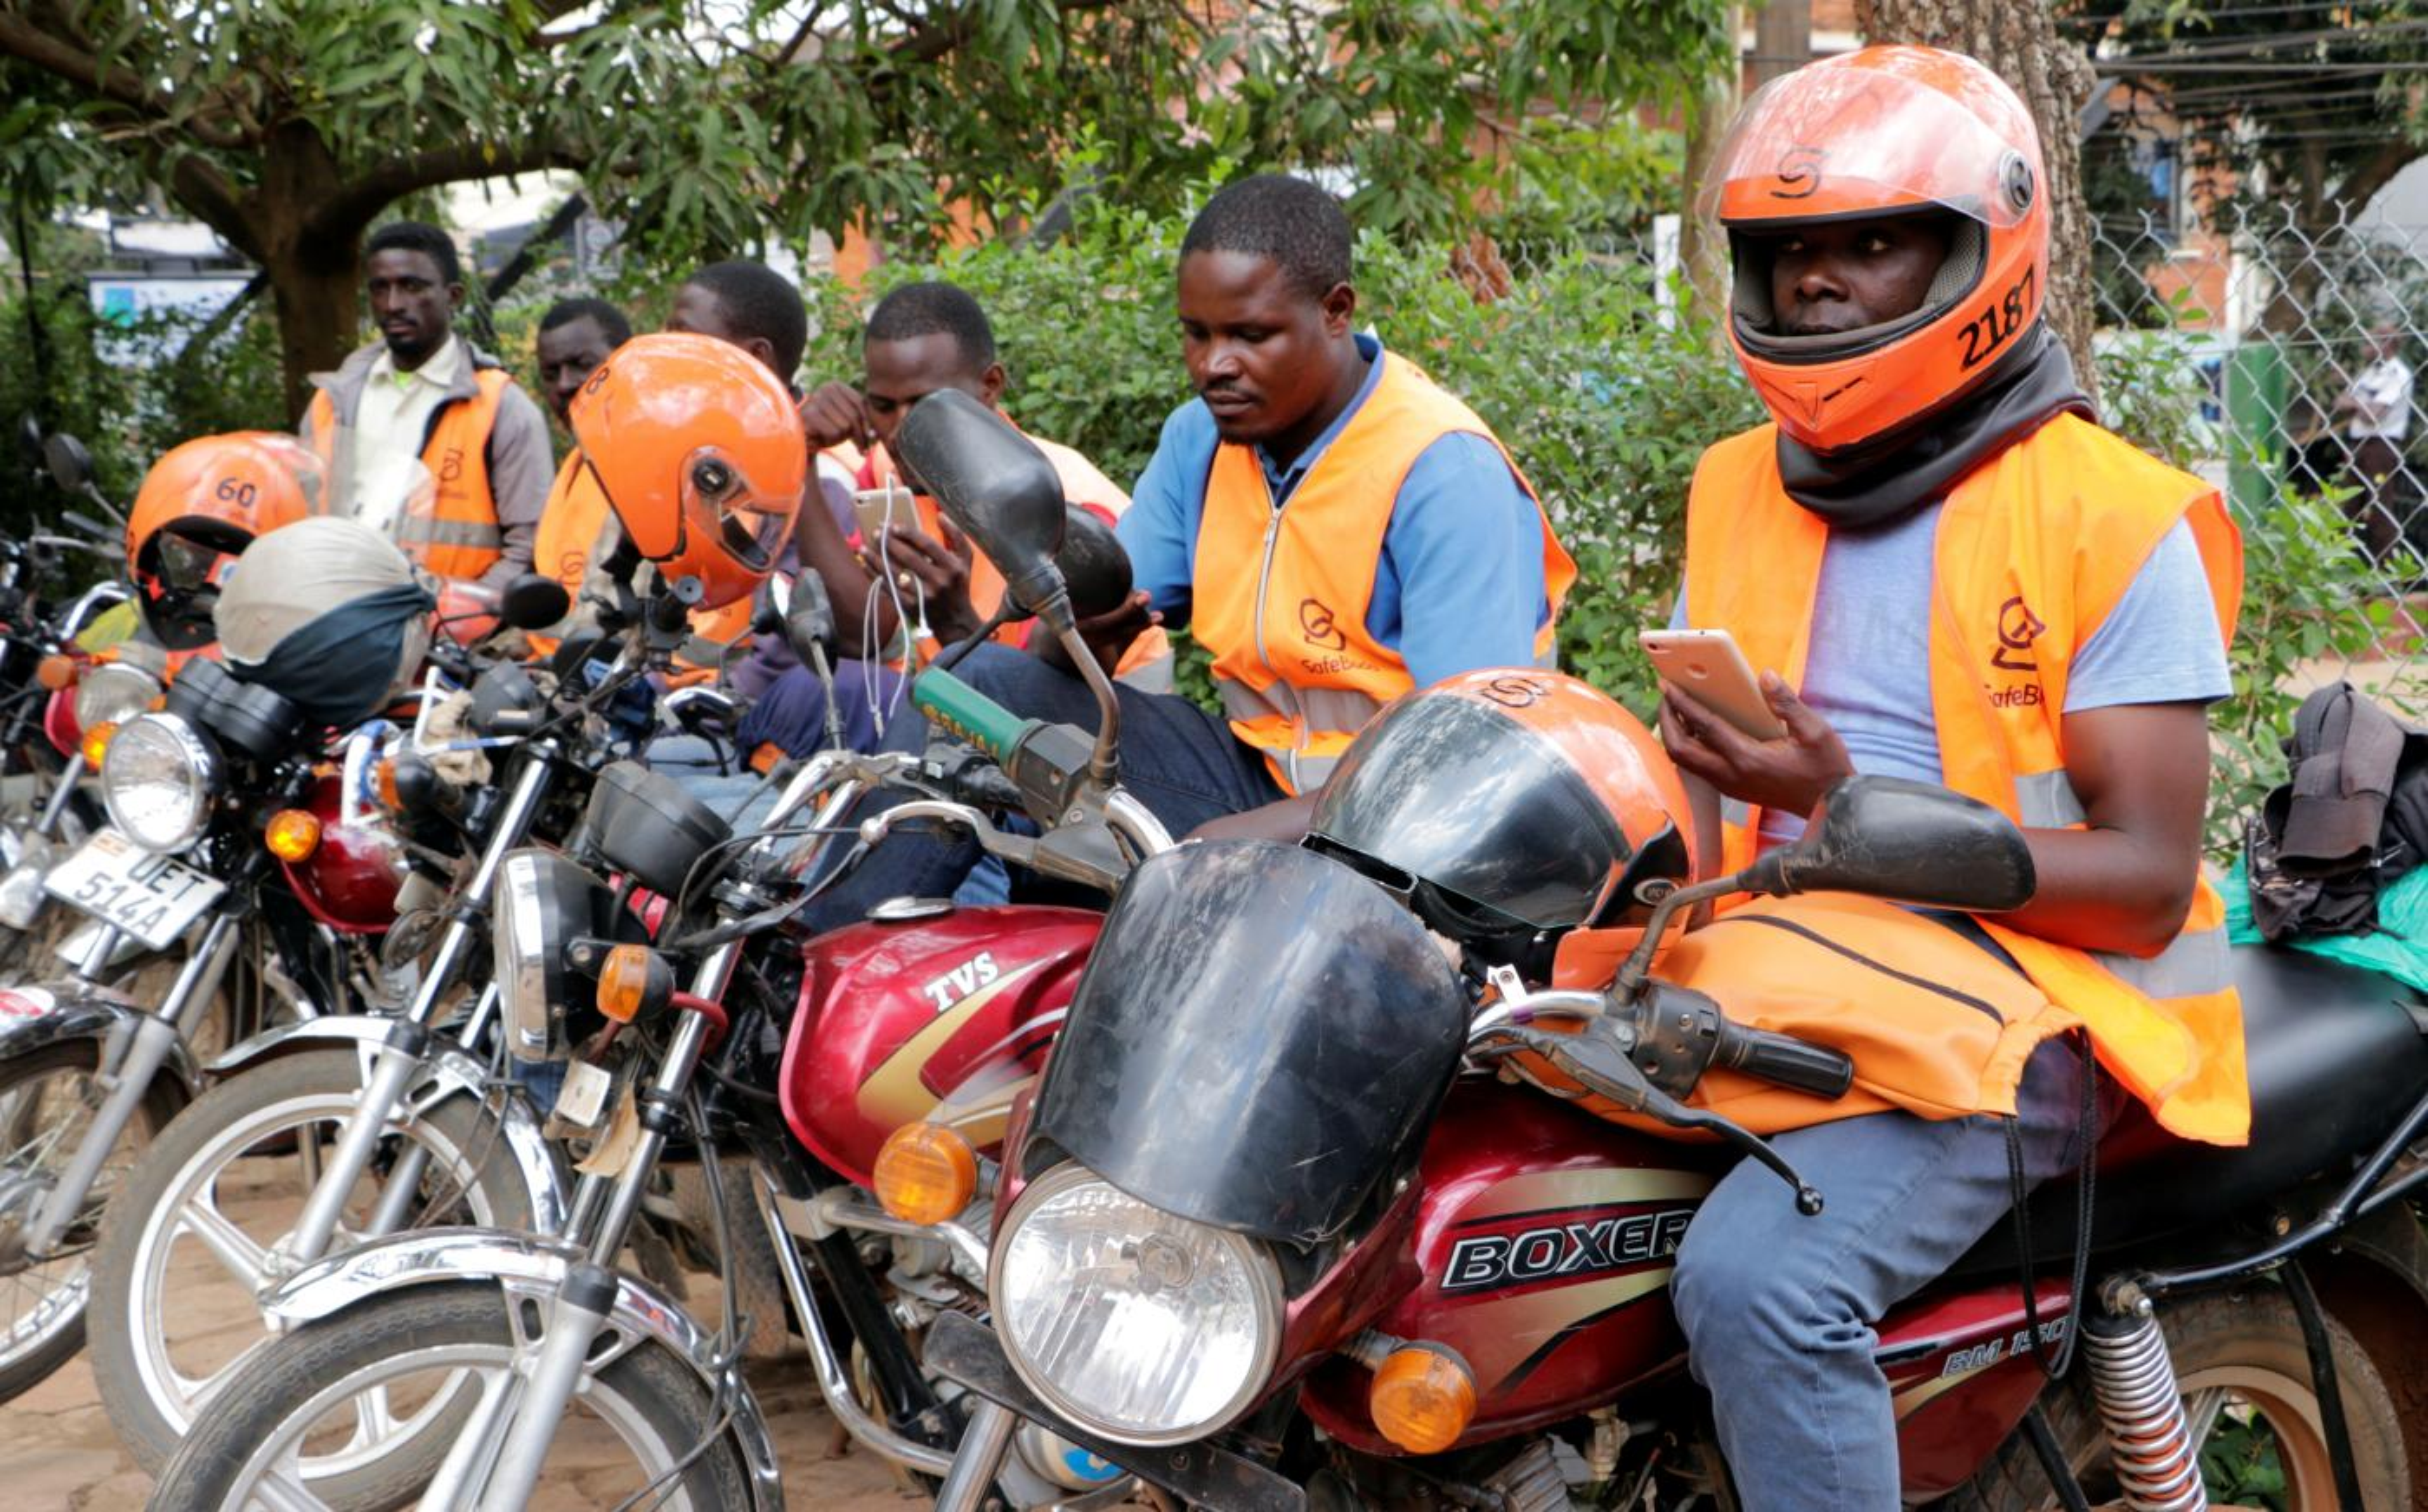 Lagos motorcycle startups Gokada, Max, SafeBoda fight for